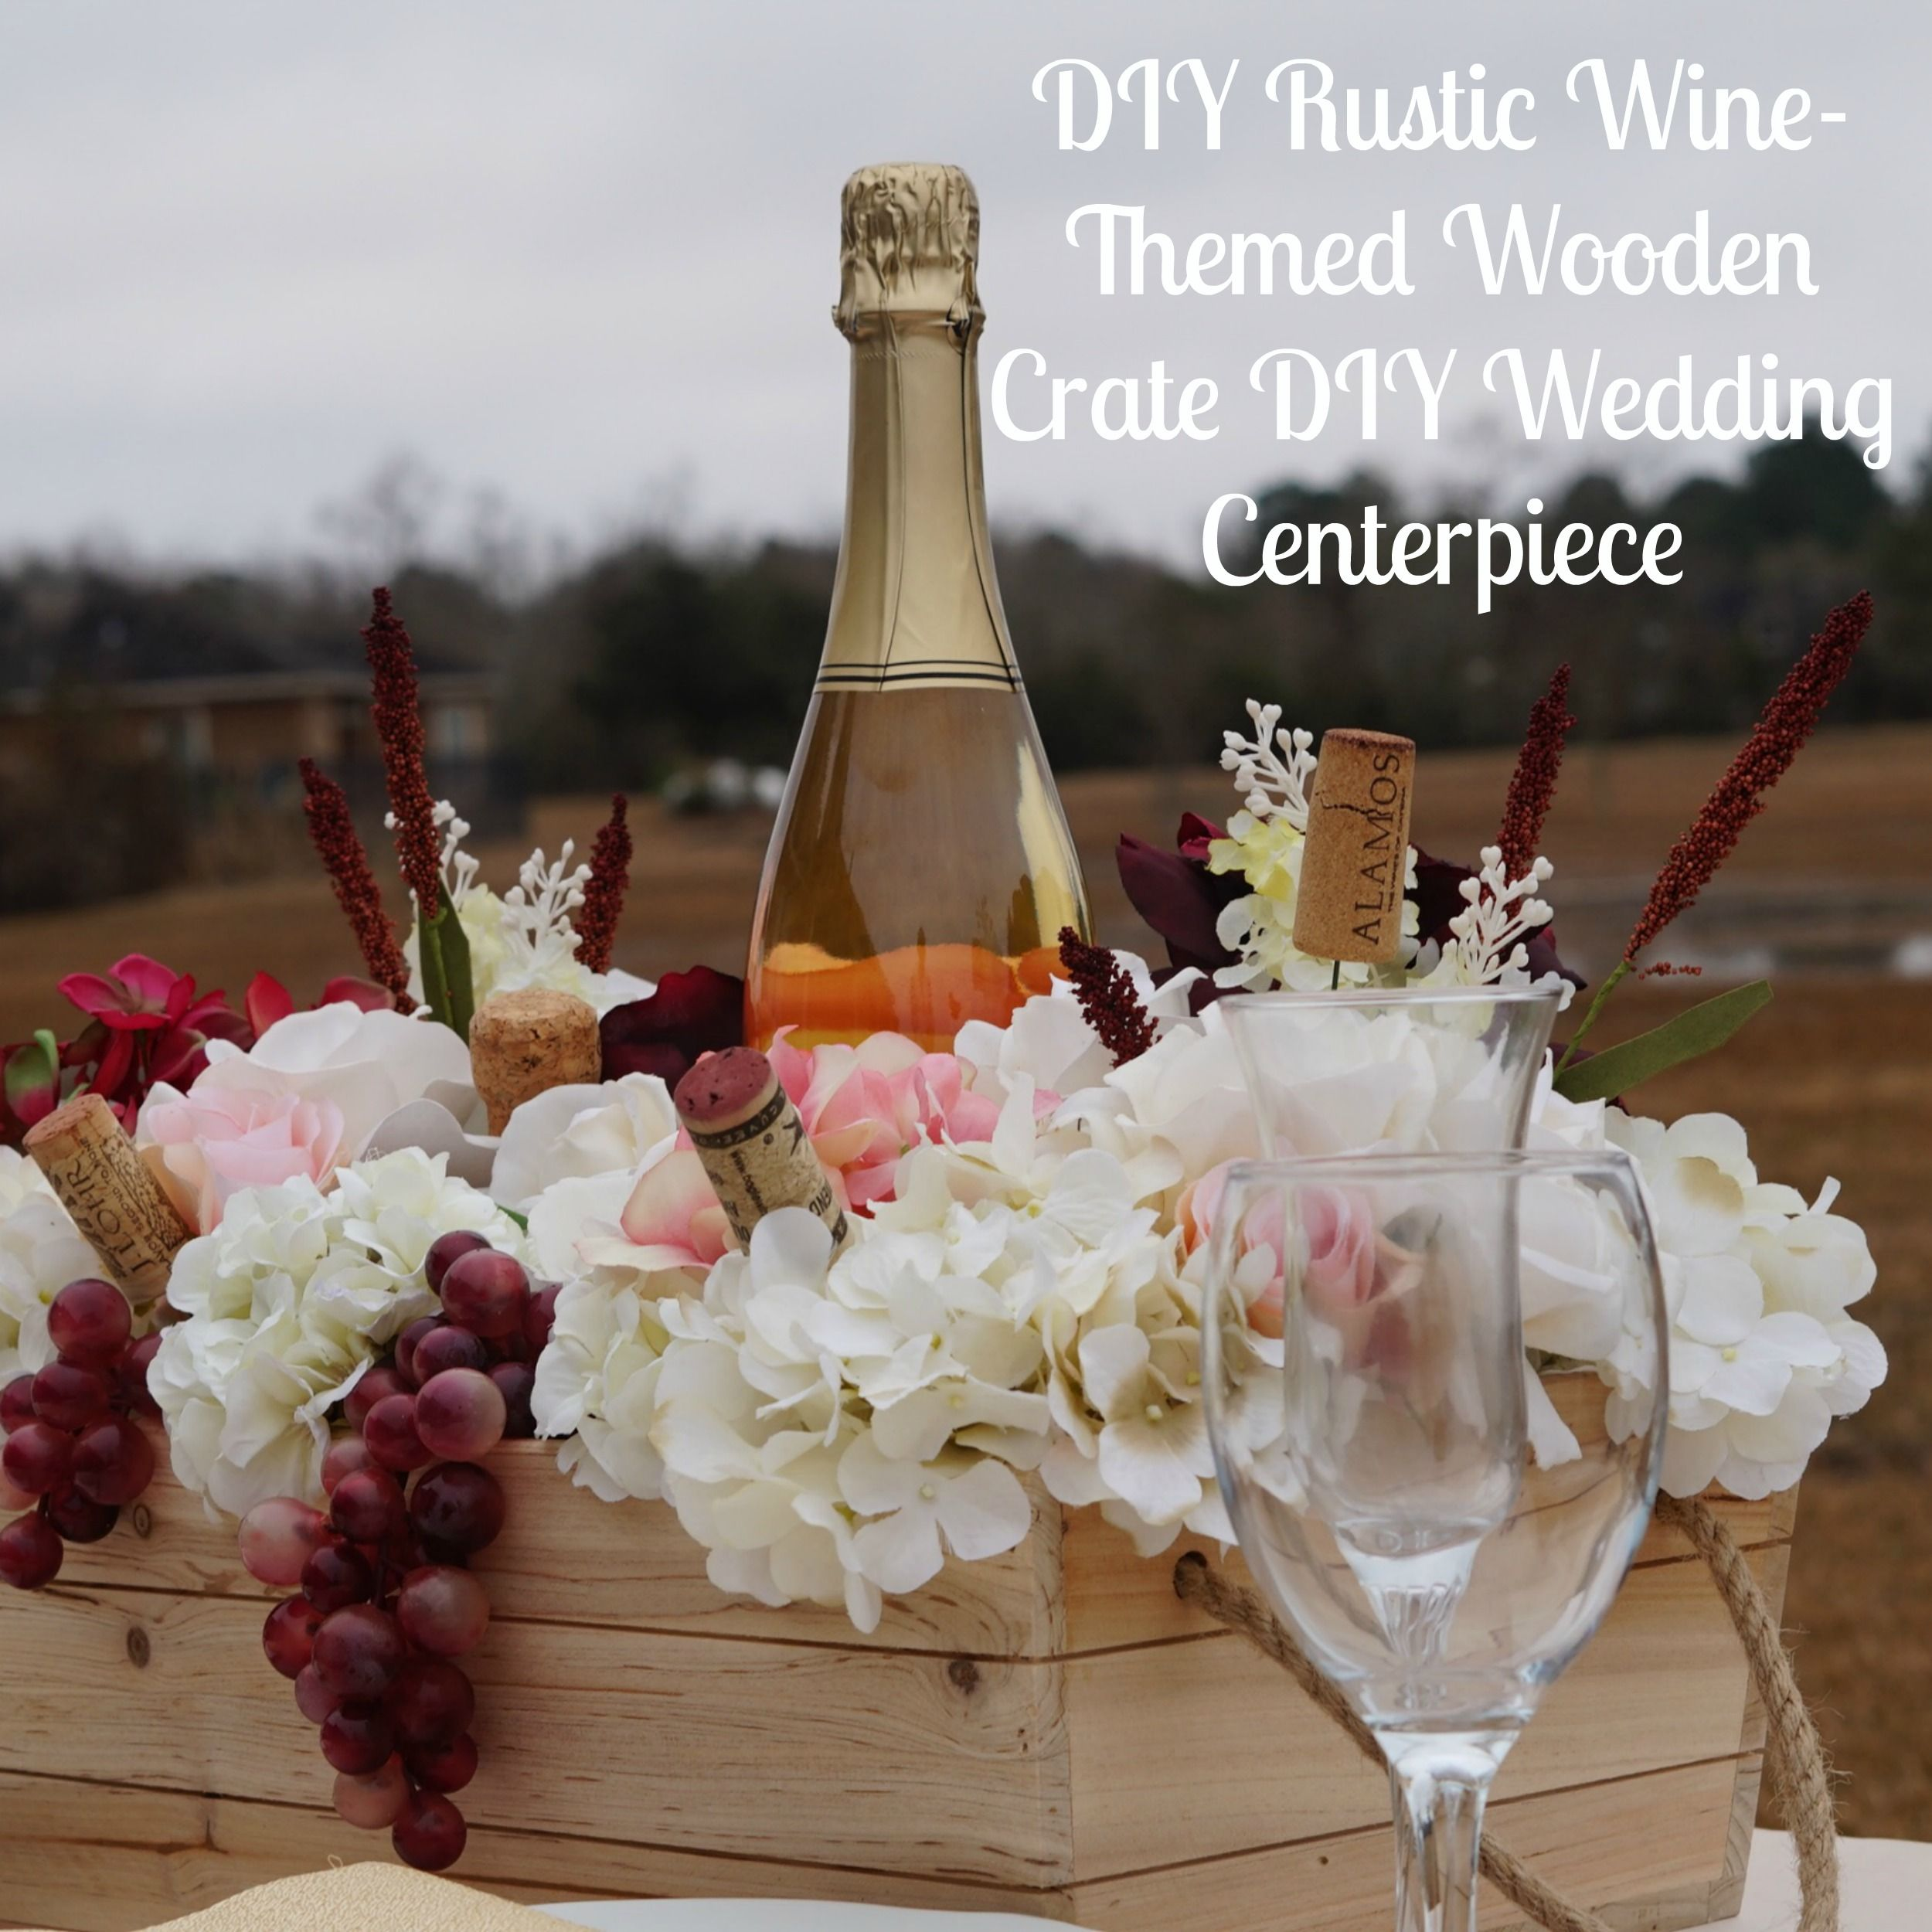 Rustic wine themed wooden crate diy wedding centerpiece wooden rustic wine themed wooden crate diy wedding centerpiece junglespirit Image collections